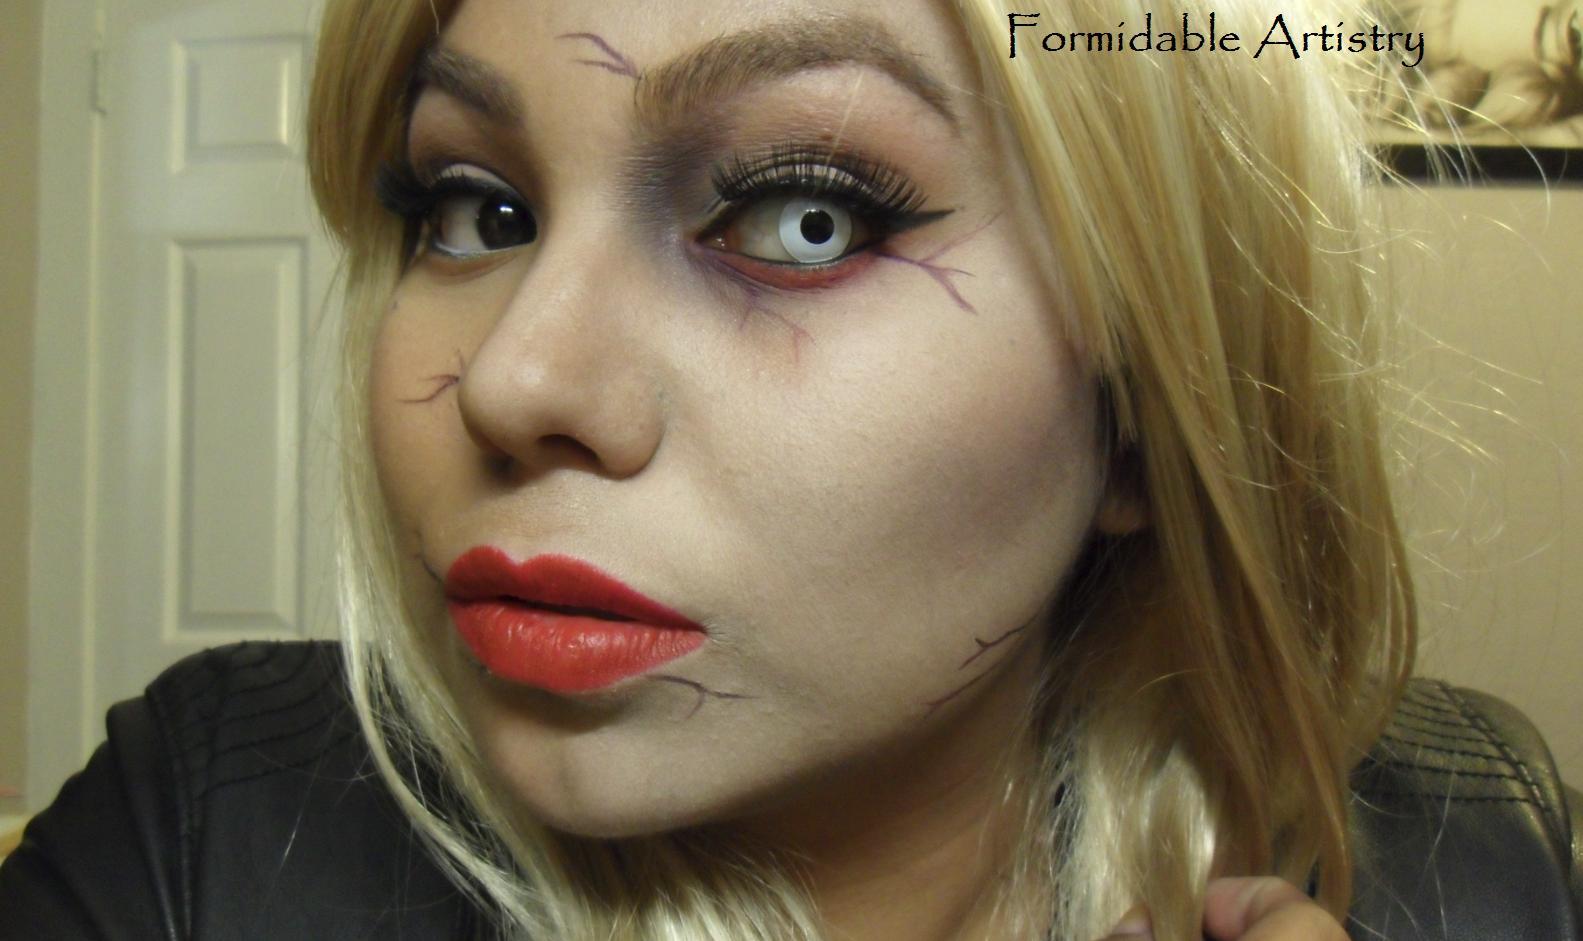 Formidableartistry Zombie Gaga Makeup Tutorial